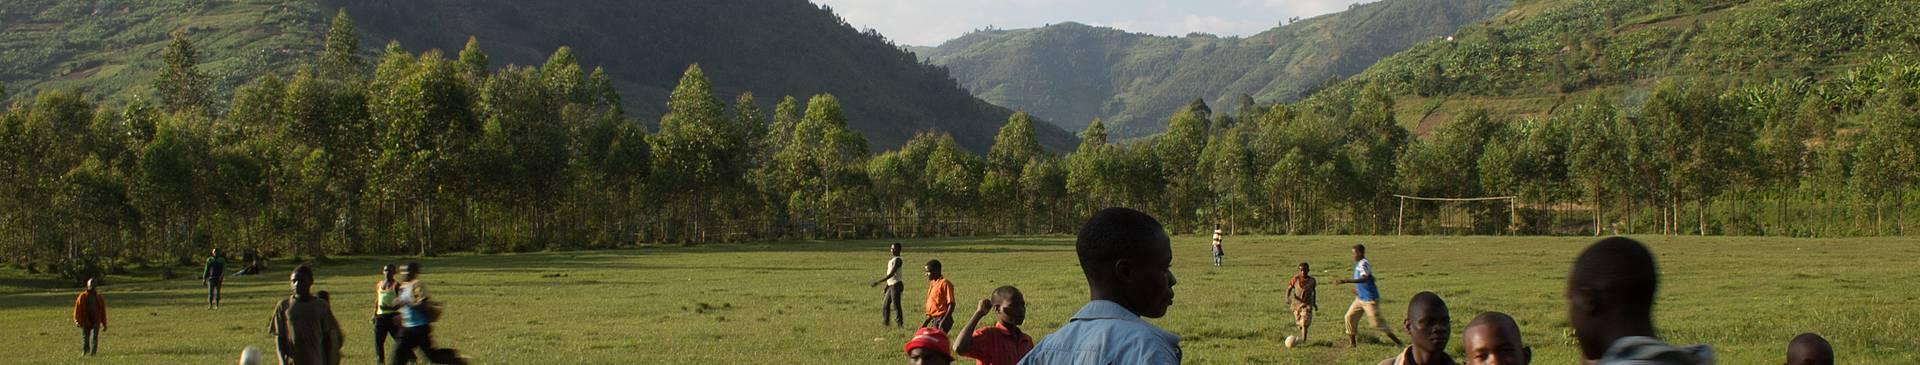 Ruanda im Dezember